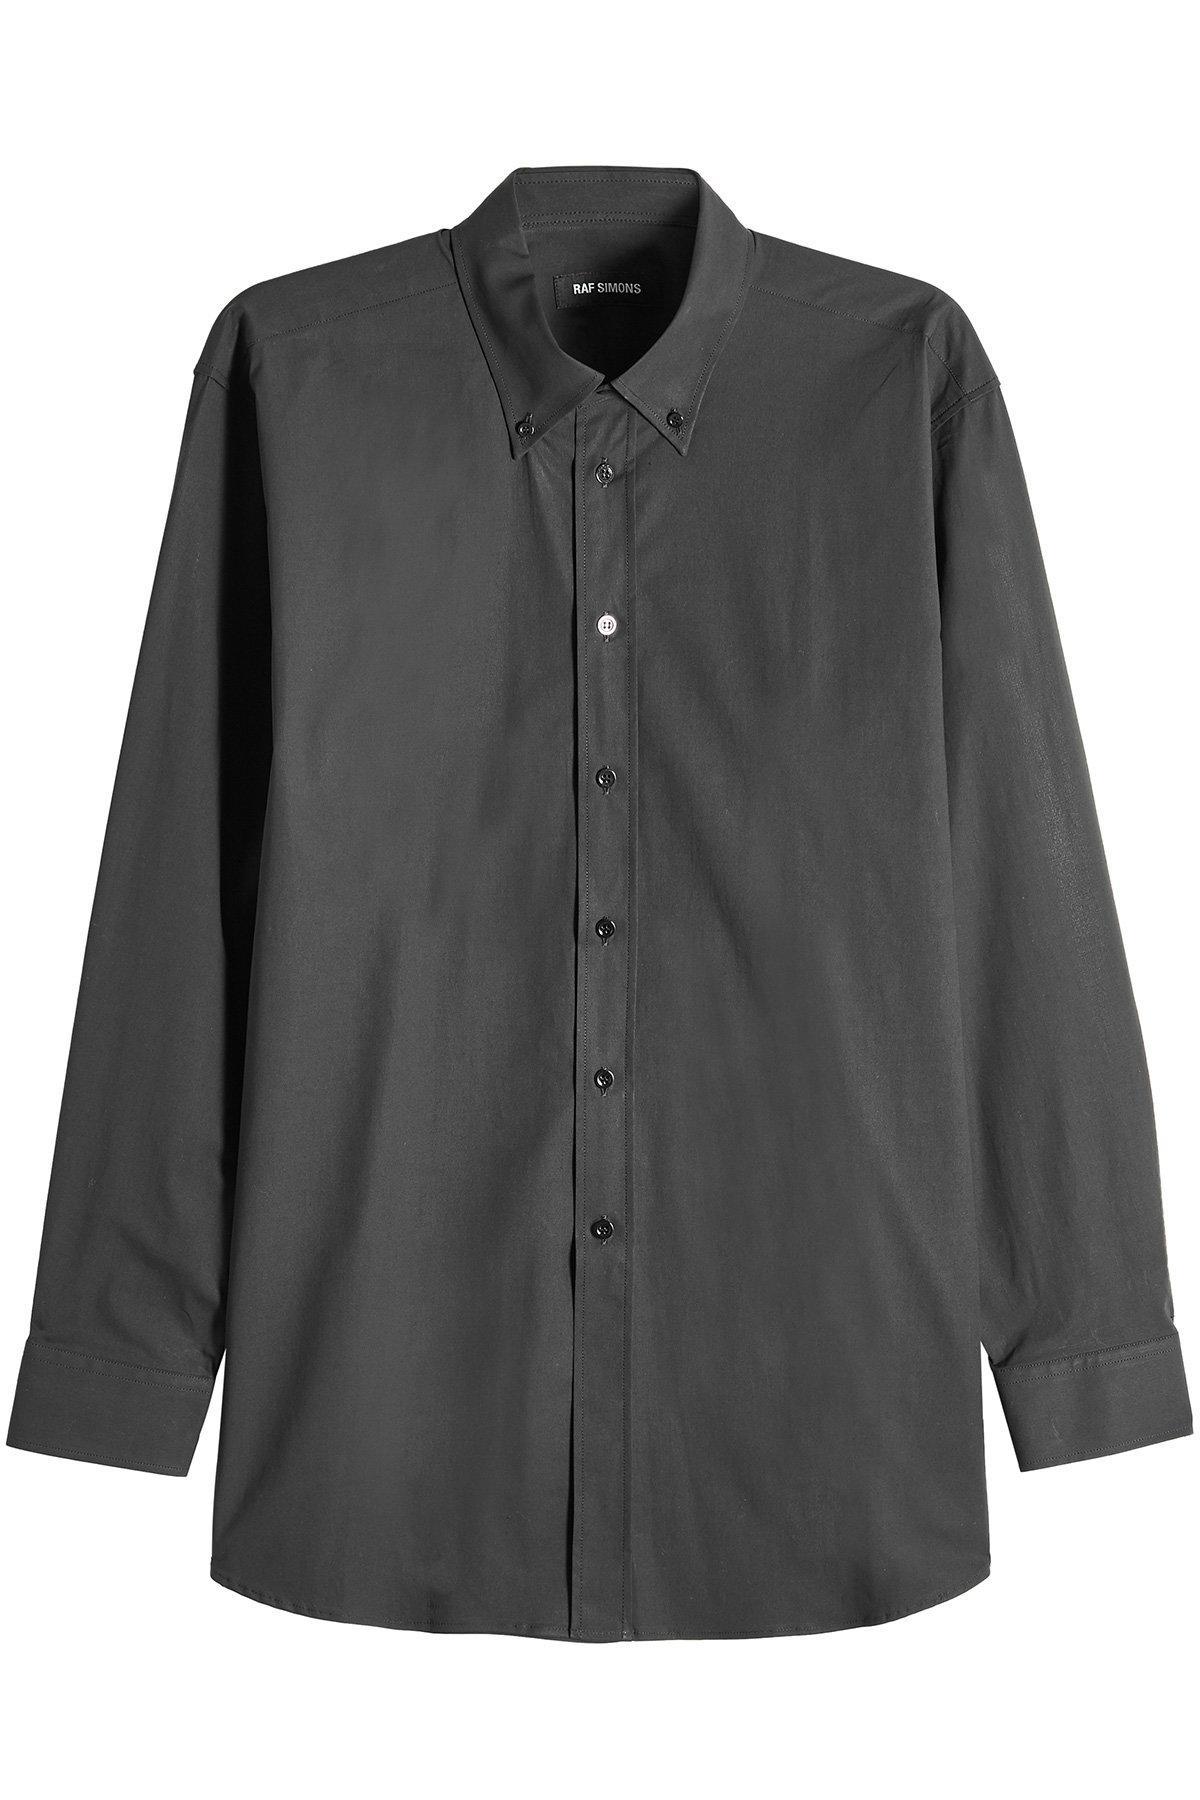 Raf Simons Printed Cotton Shirt In Black